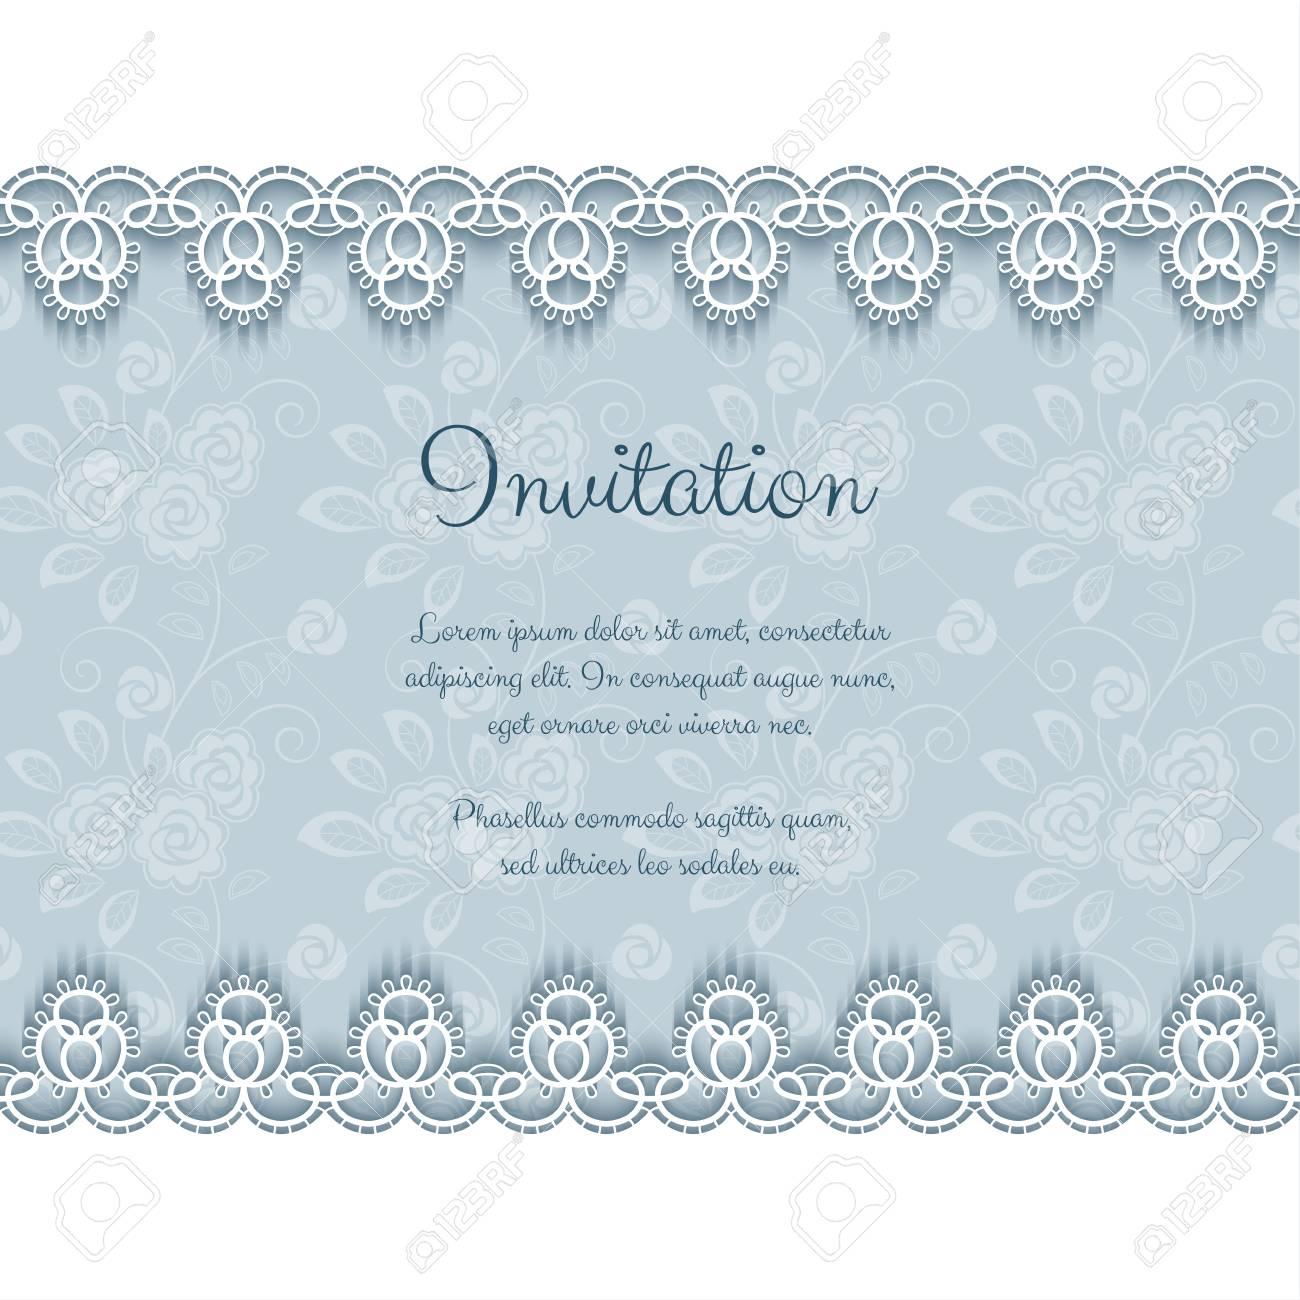 Elegant invitation or greeting card template with lace borders elegant invitation or greeting card template with lace borders vector illustration stock vector 78500150 stopboris Choice Image